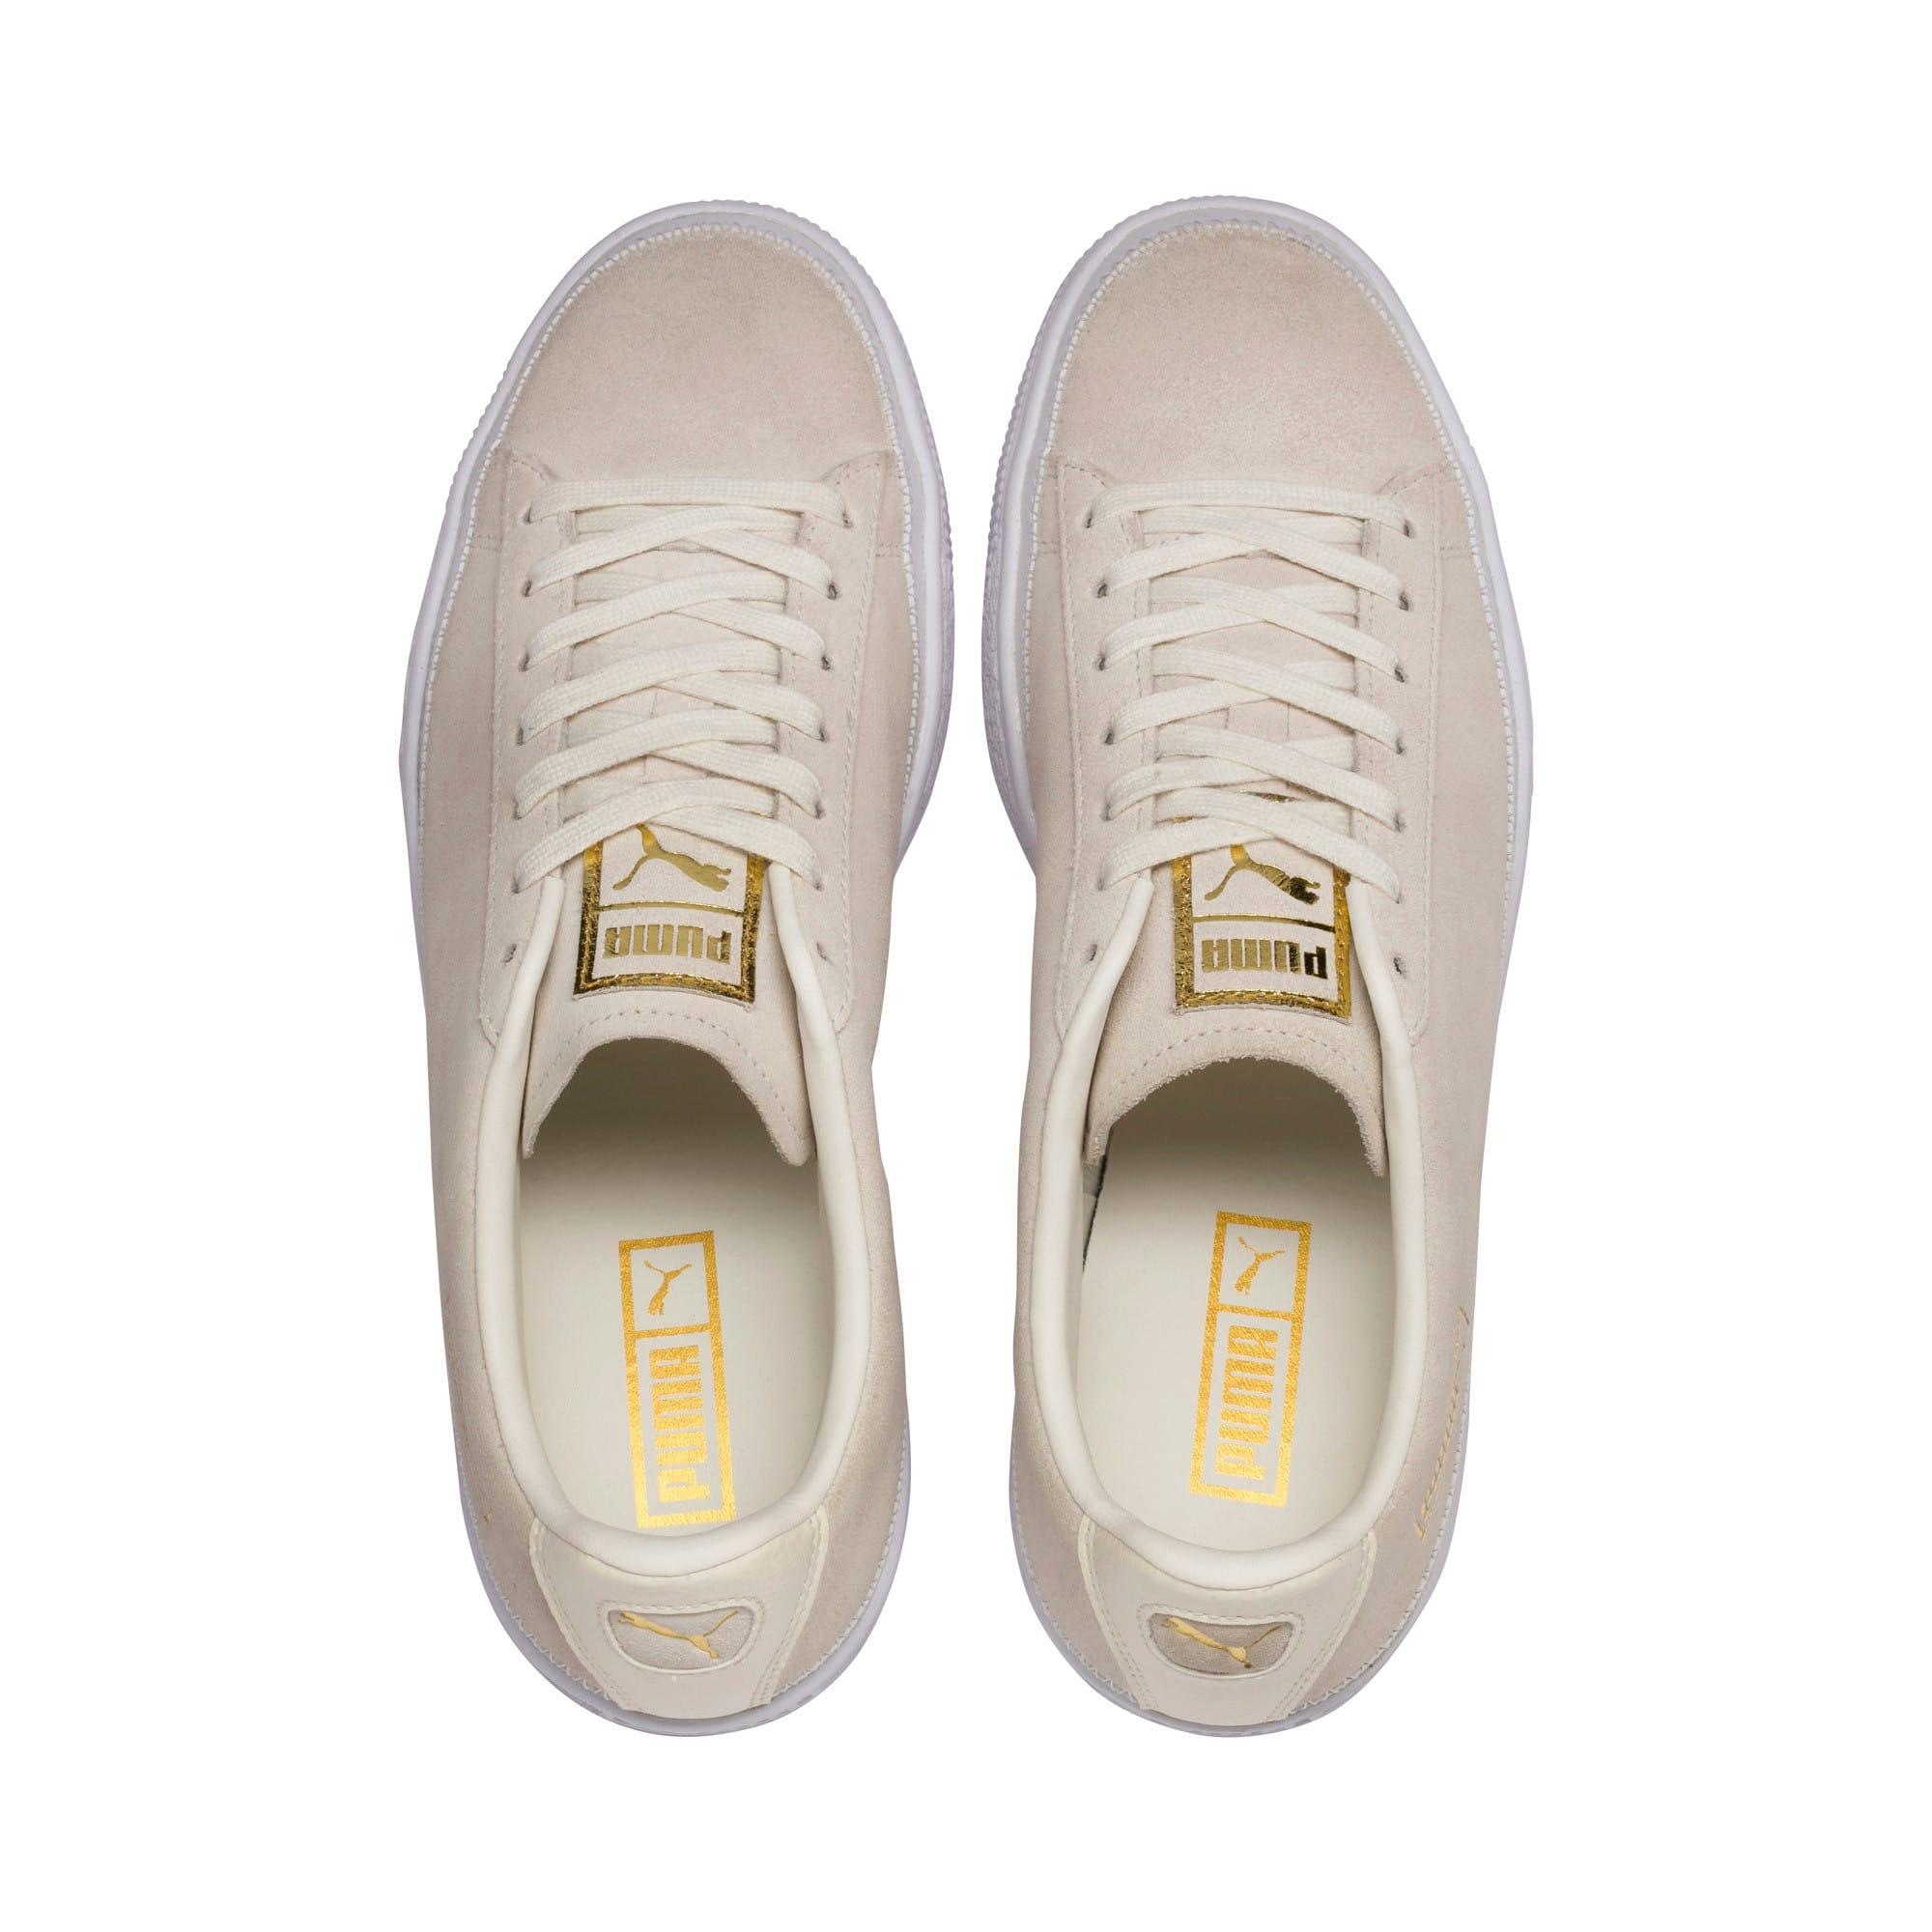 Thumbnail 7 of Suede Trim Sneaker, Whisper White-White- Gold, medium